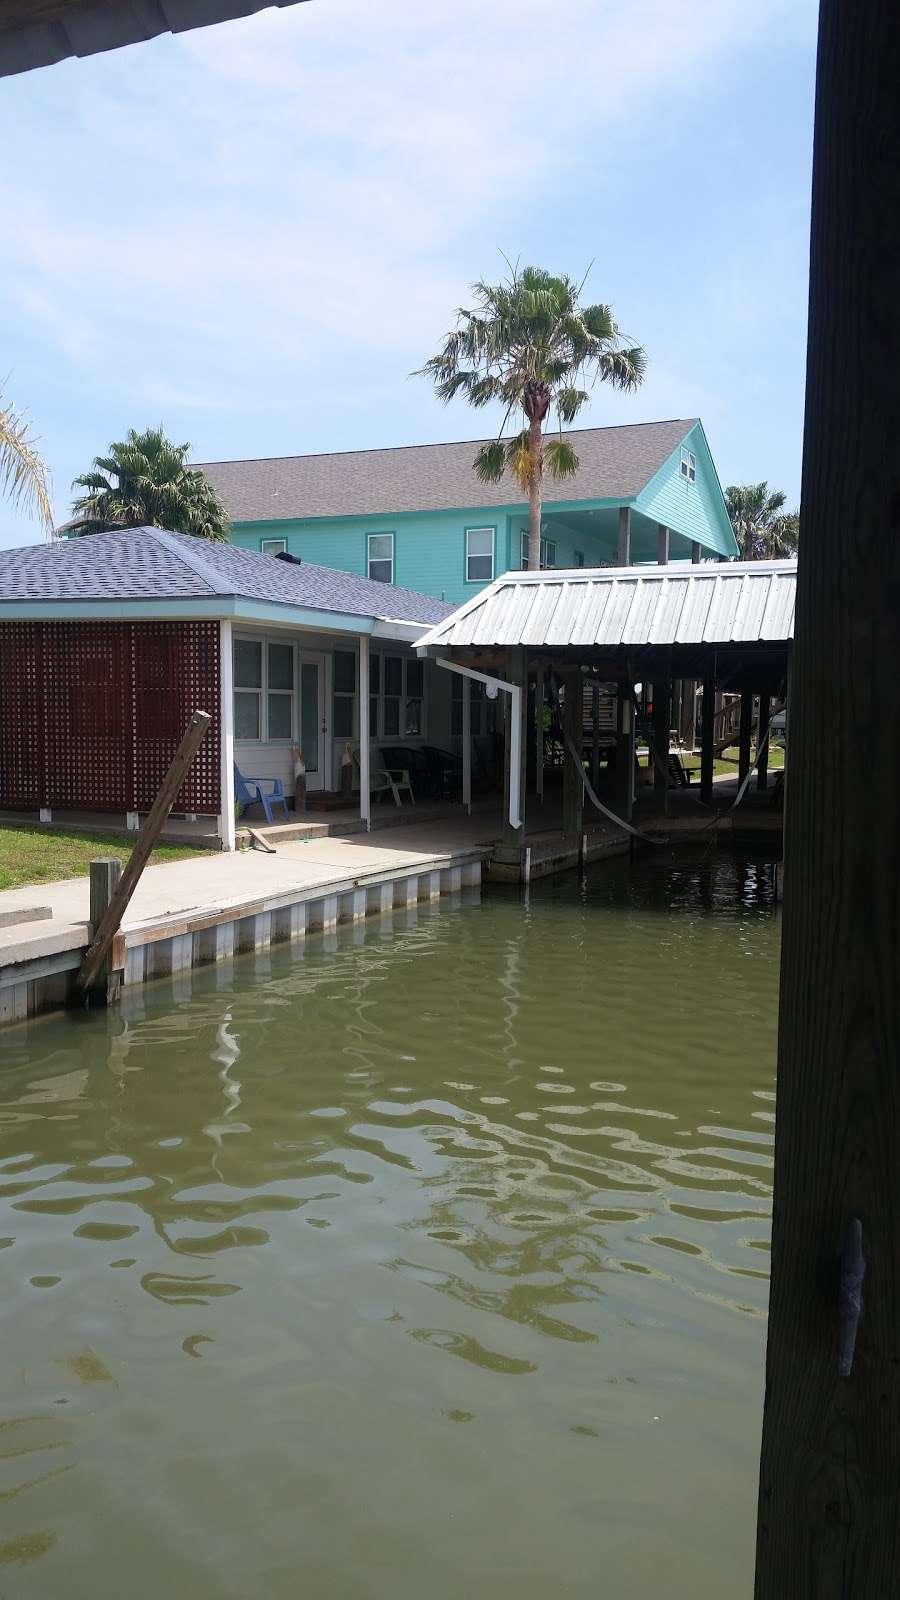 Paulas Vineyard RV Resort - rv park  | Photo 6 of 10 | Address: 1250 N Crystal Beach Rd, Port Bolivar, TX 77650, USA | Phone: (409) 684-9970